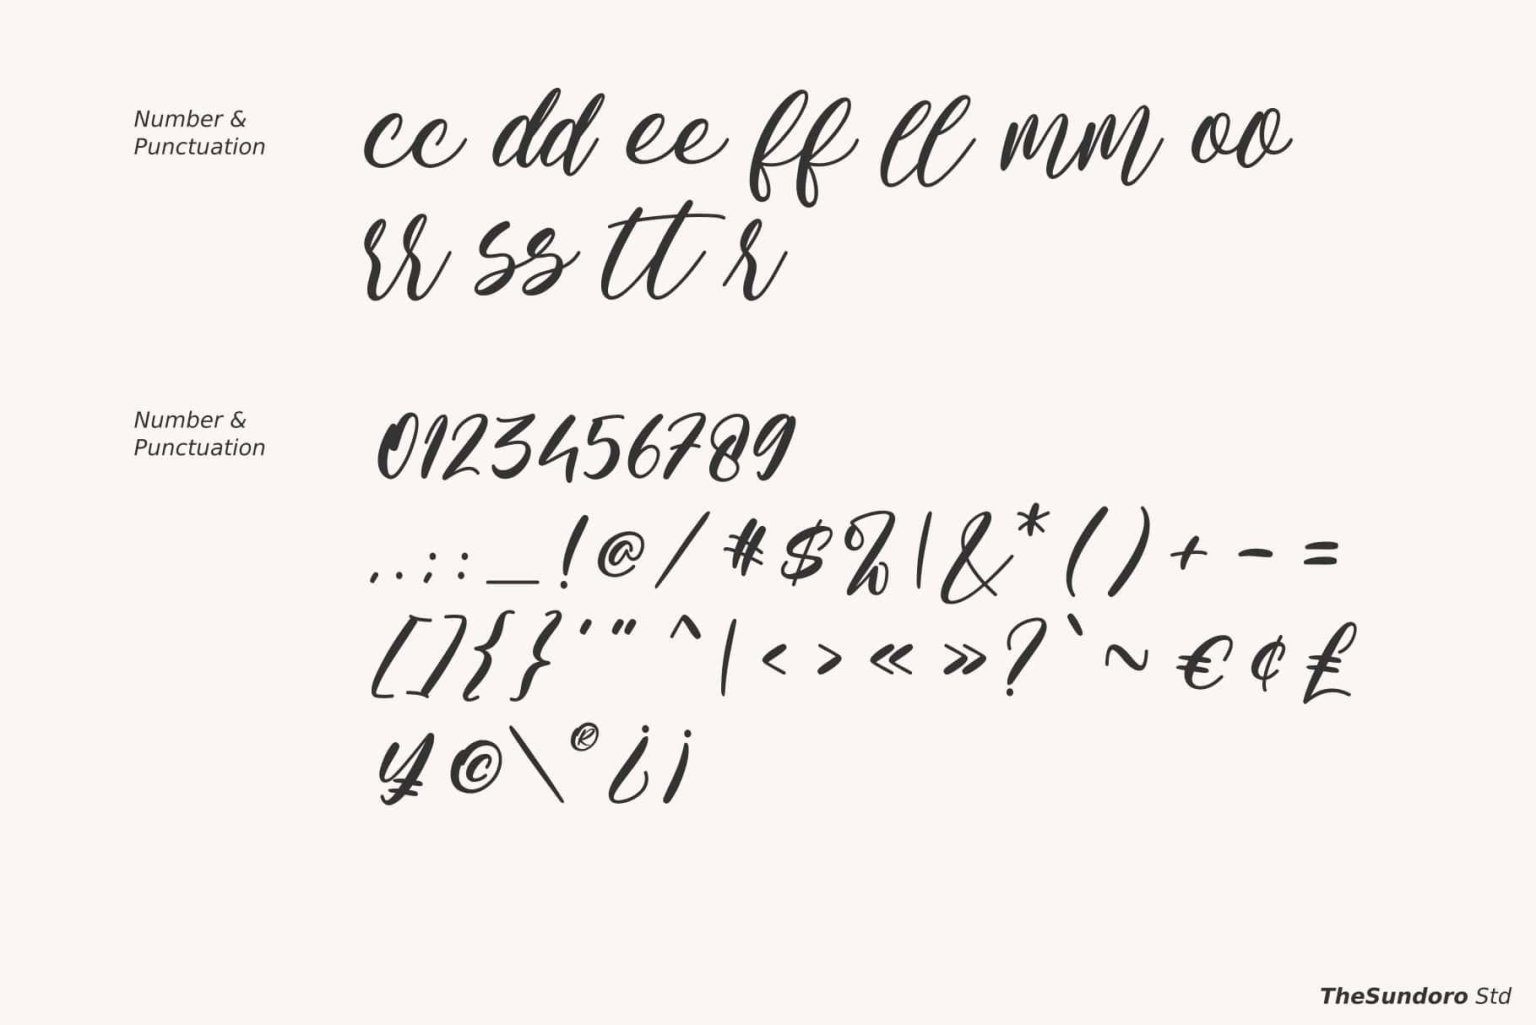 ff8de62cdd26f043222401f3c6fb4c02ebf22e735bcfba2177af067fb616db56 (1)